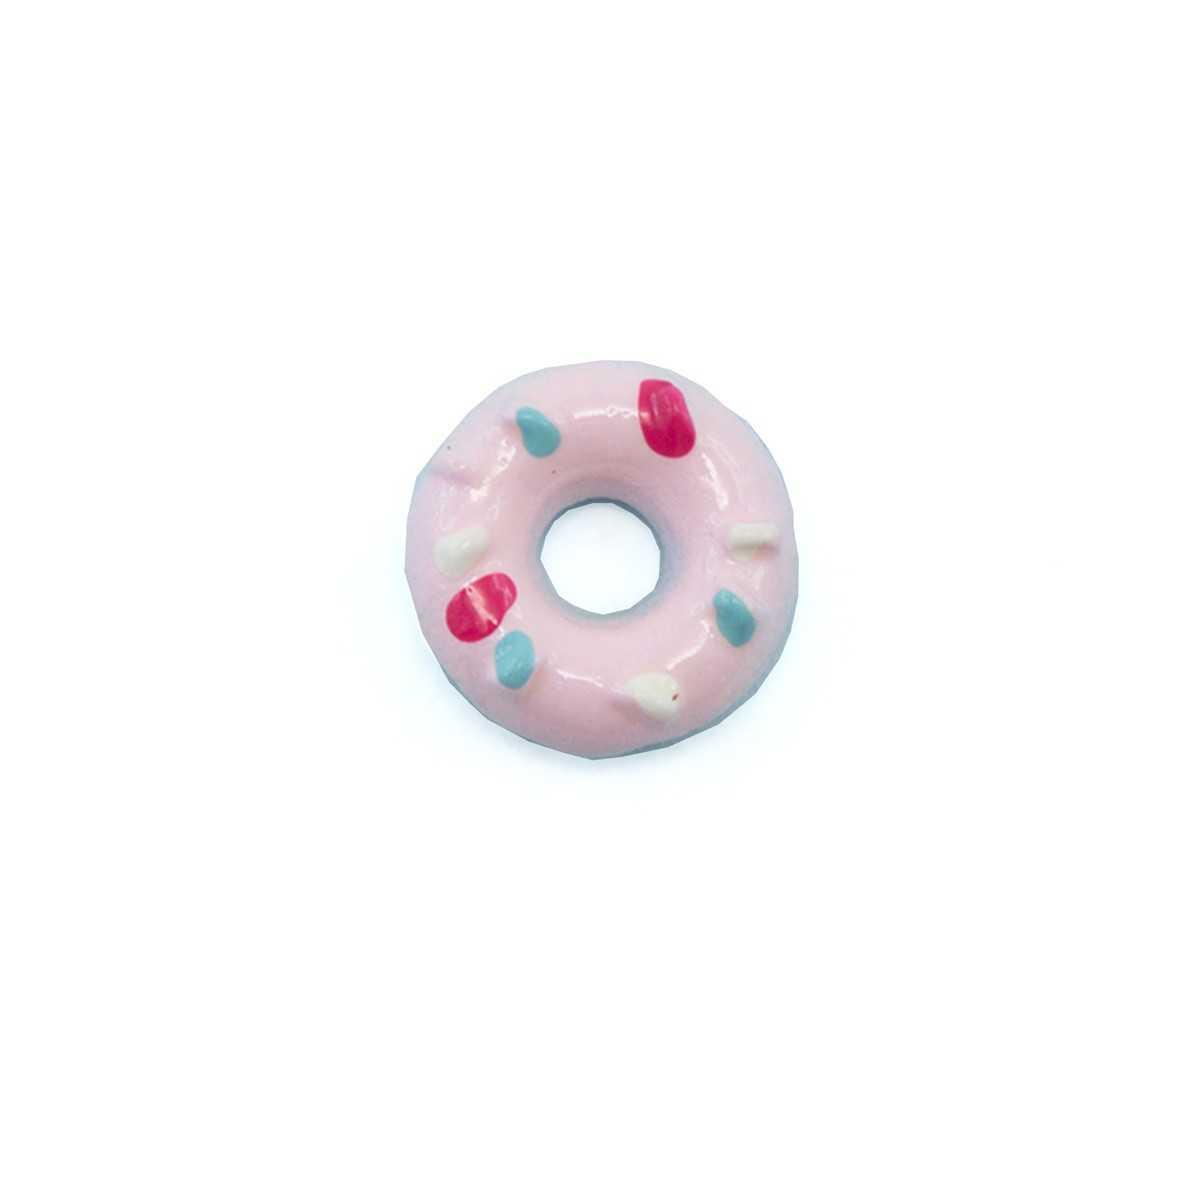 https://www.kit-manucure.com/1486-thickbox_default/bijoux-pour-ongles-donuts-rose-et-bleu.jpg